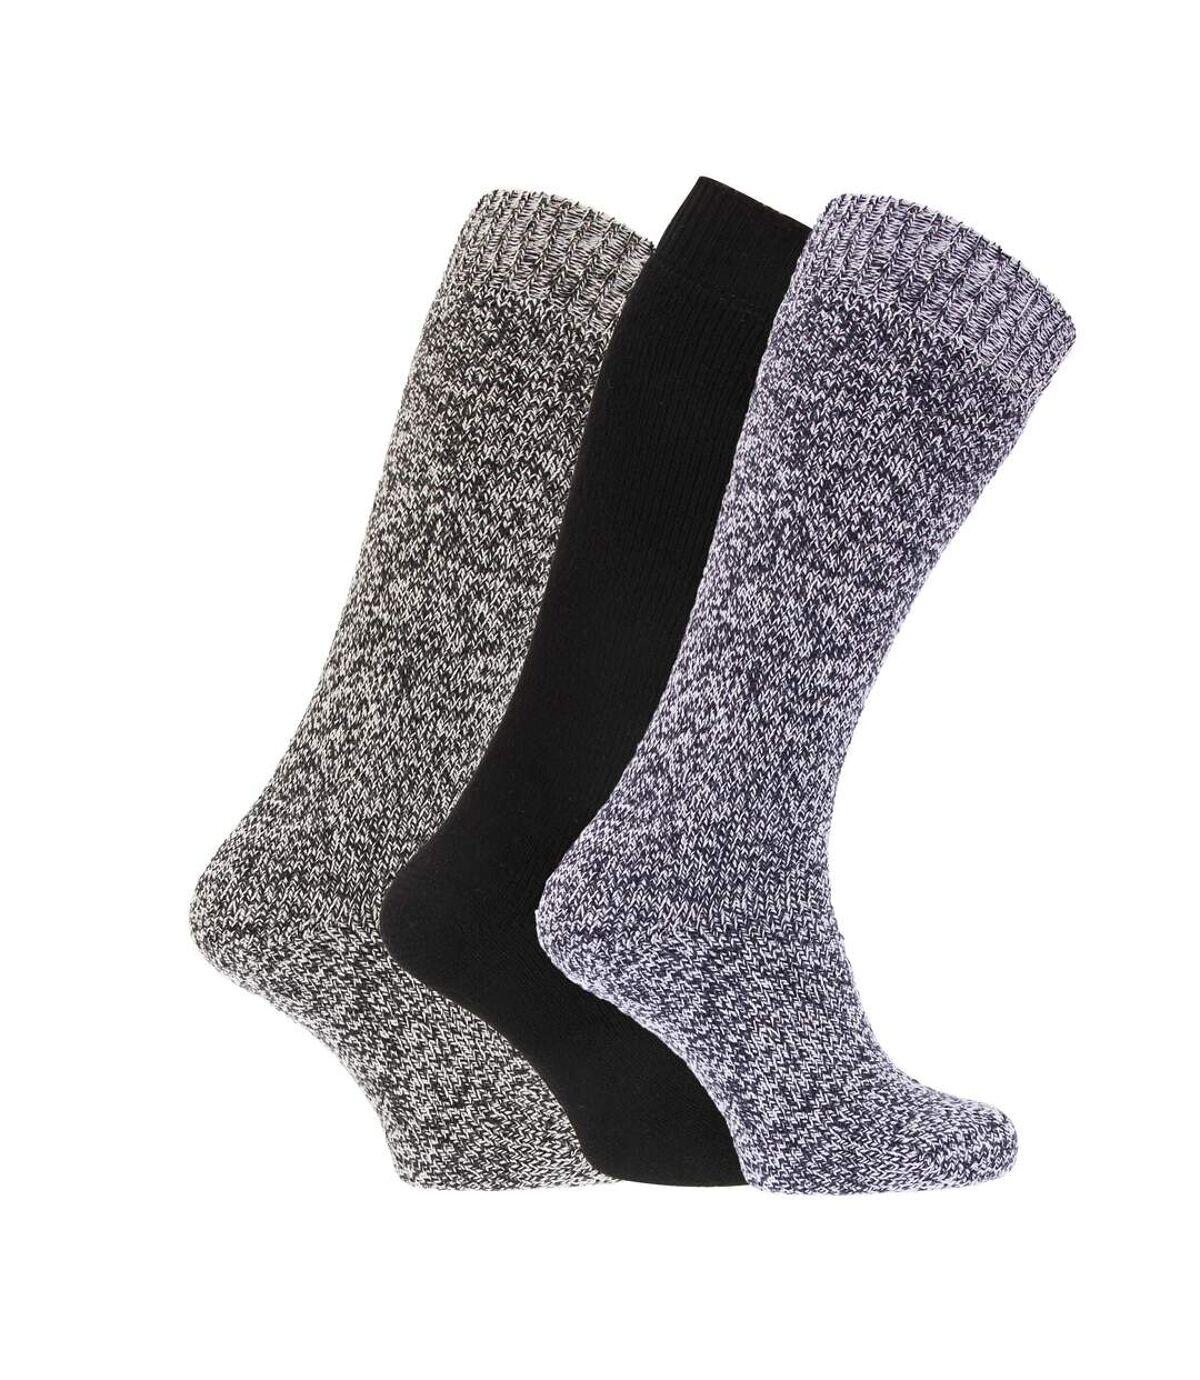 Mens Thermal Wool Blend Long Wellington Boot Socks (Pack Of 3) (Grey/ Navy) - UTMB147